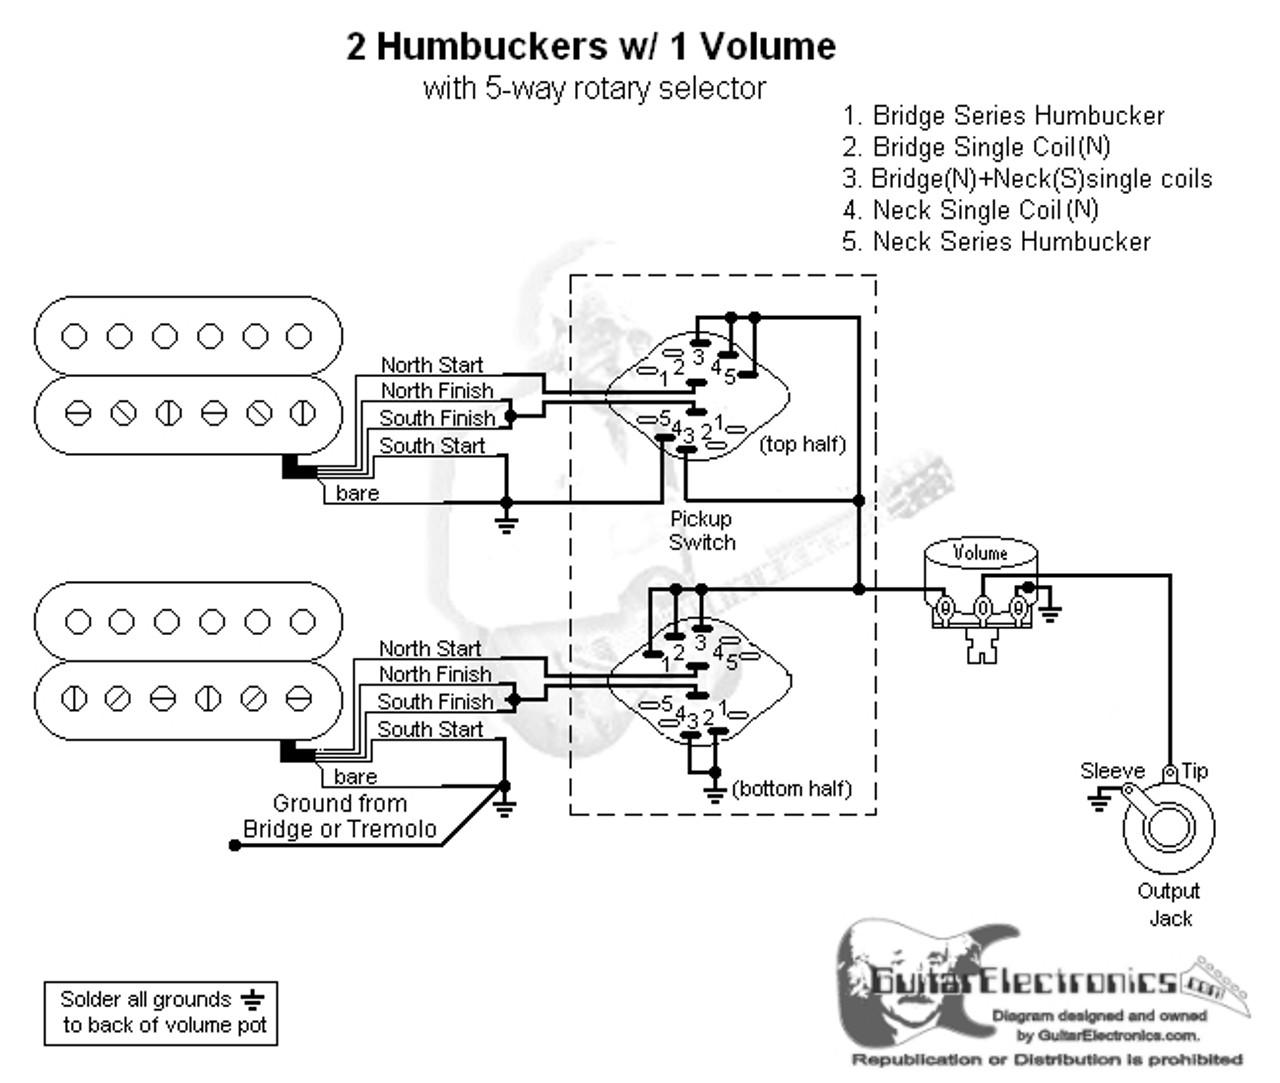 hight resolution of 2 humbuckers 5 way rotary switch 1 volume 01 5 way switch wiring diagram leviton 5 way rotary switch wiring diagram